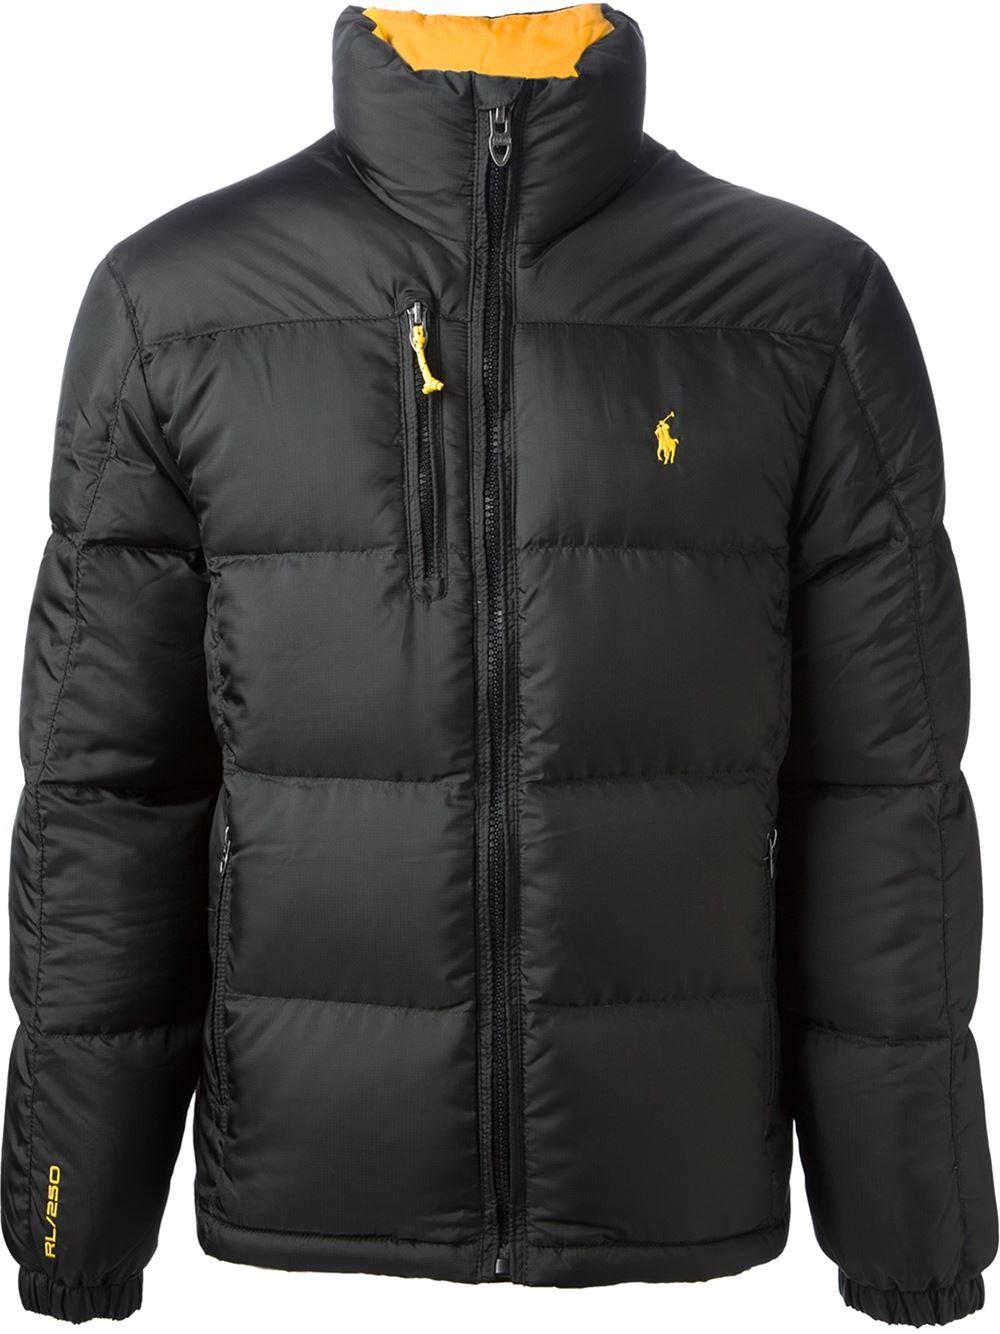 polo ralph lauren classic padded jacket in black for men. Black Bedroom Furniture Sets. Home Design Ideas